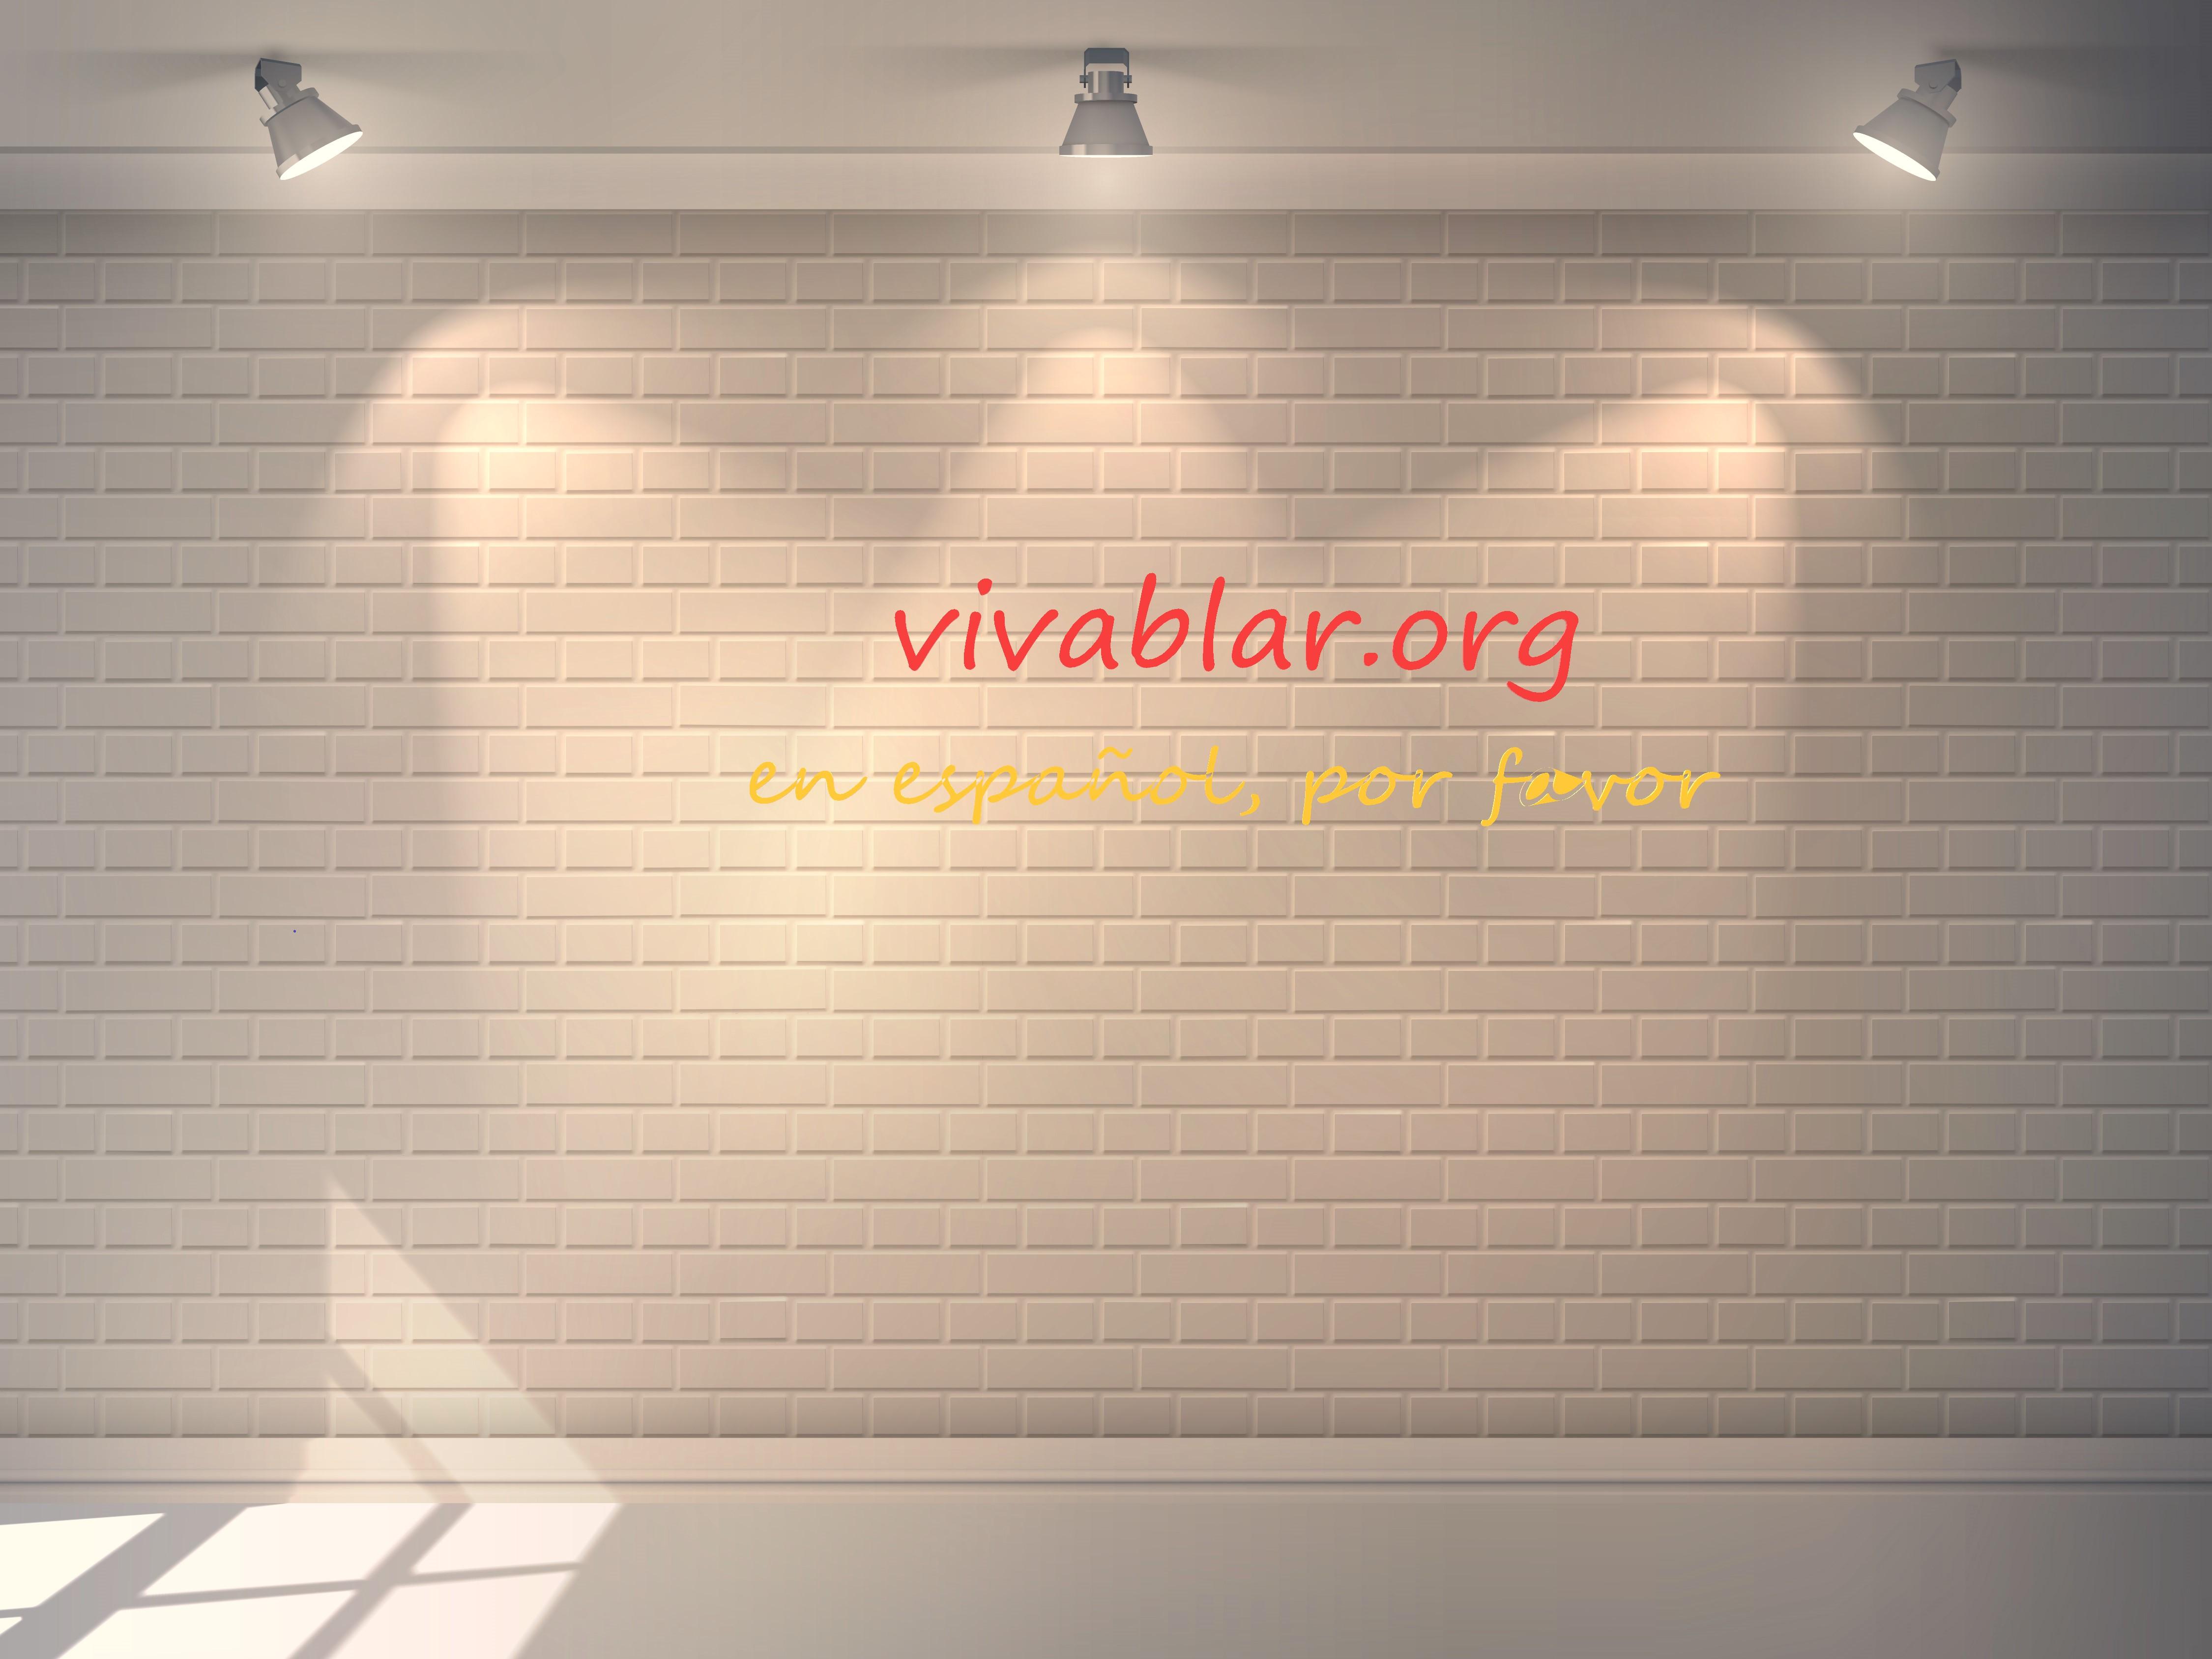 vivablar.org